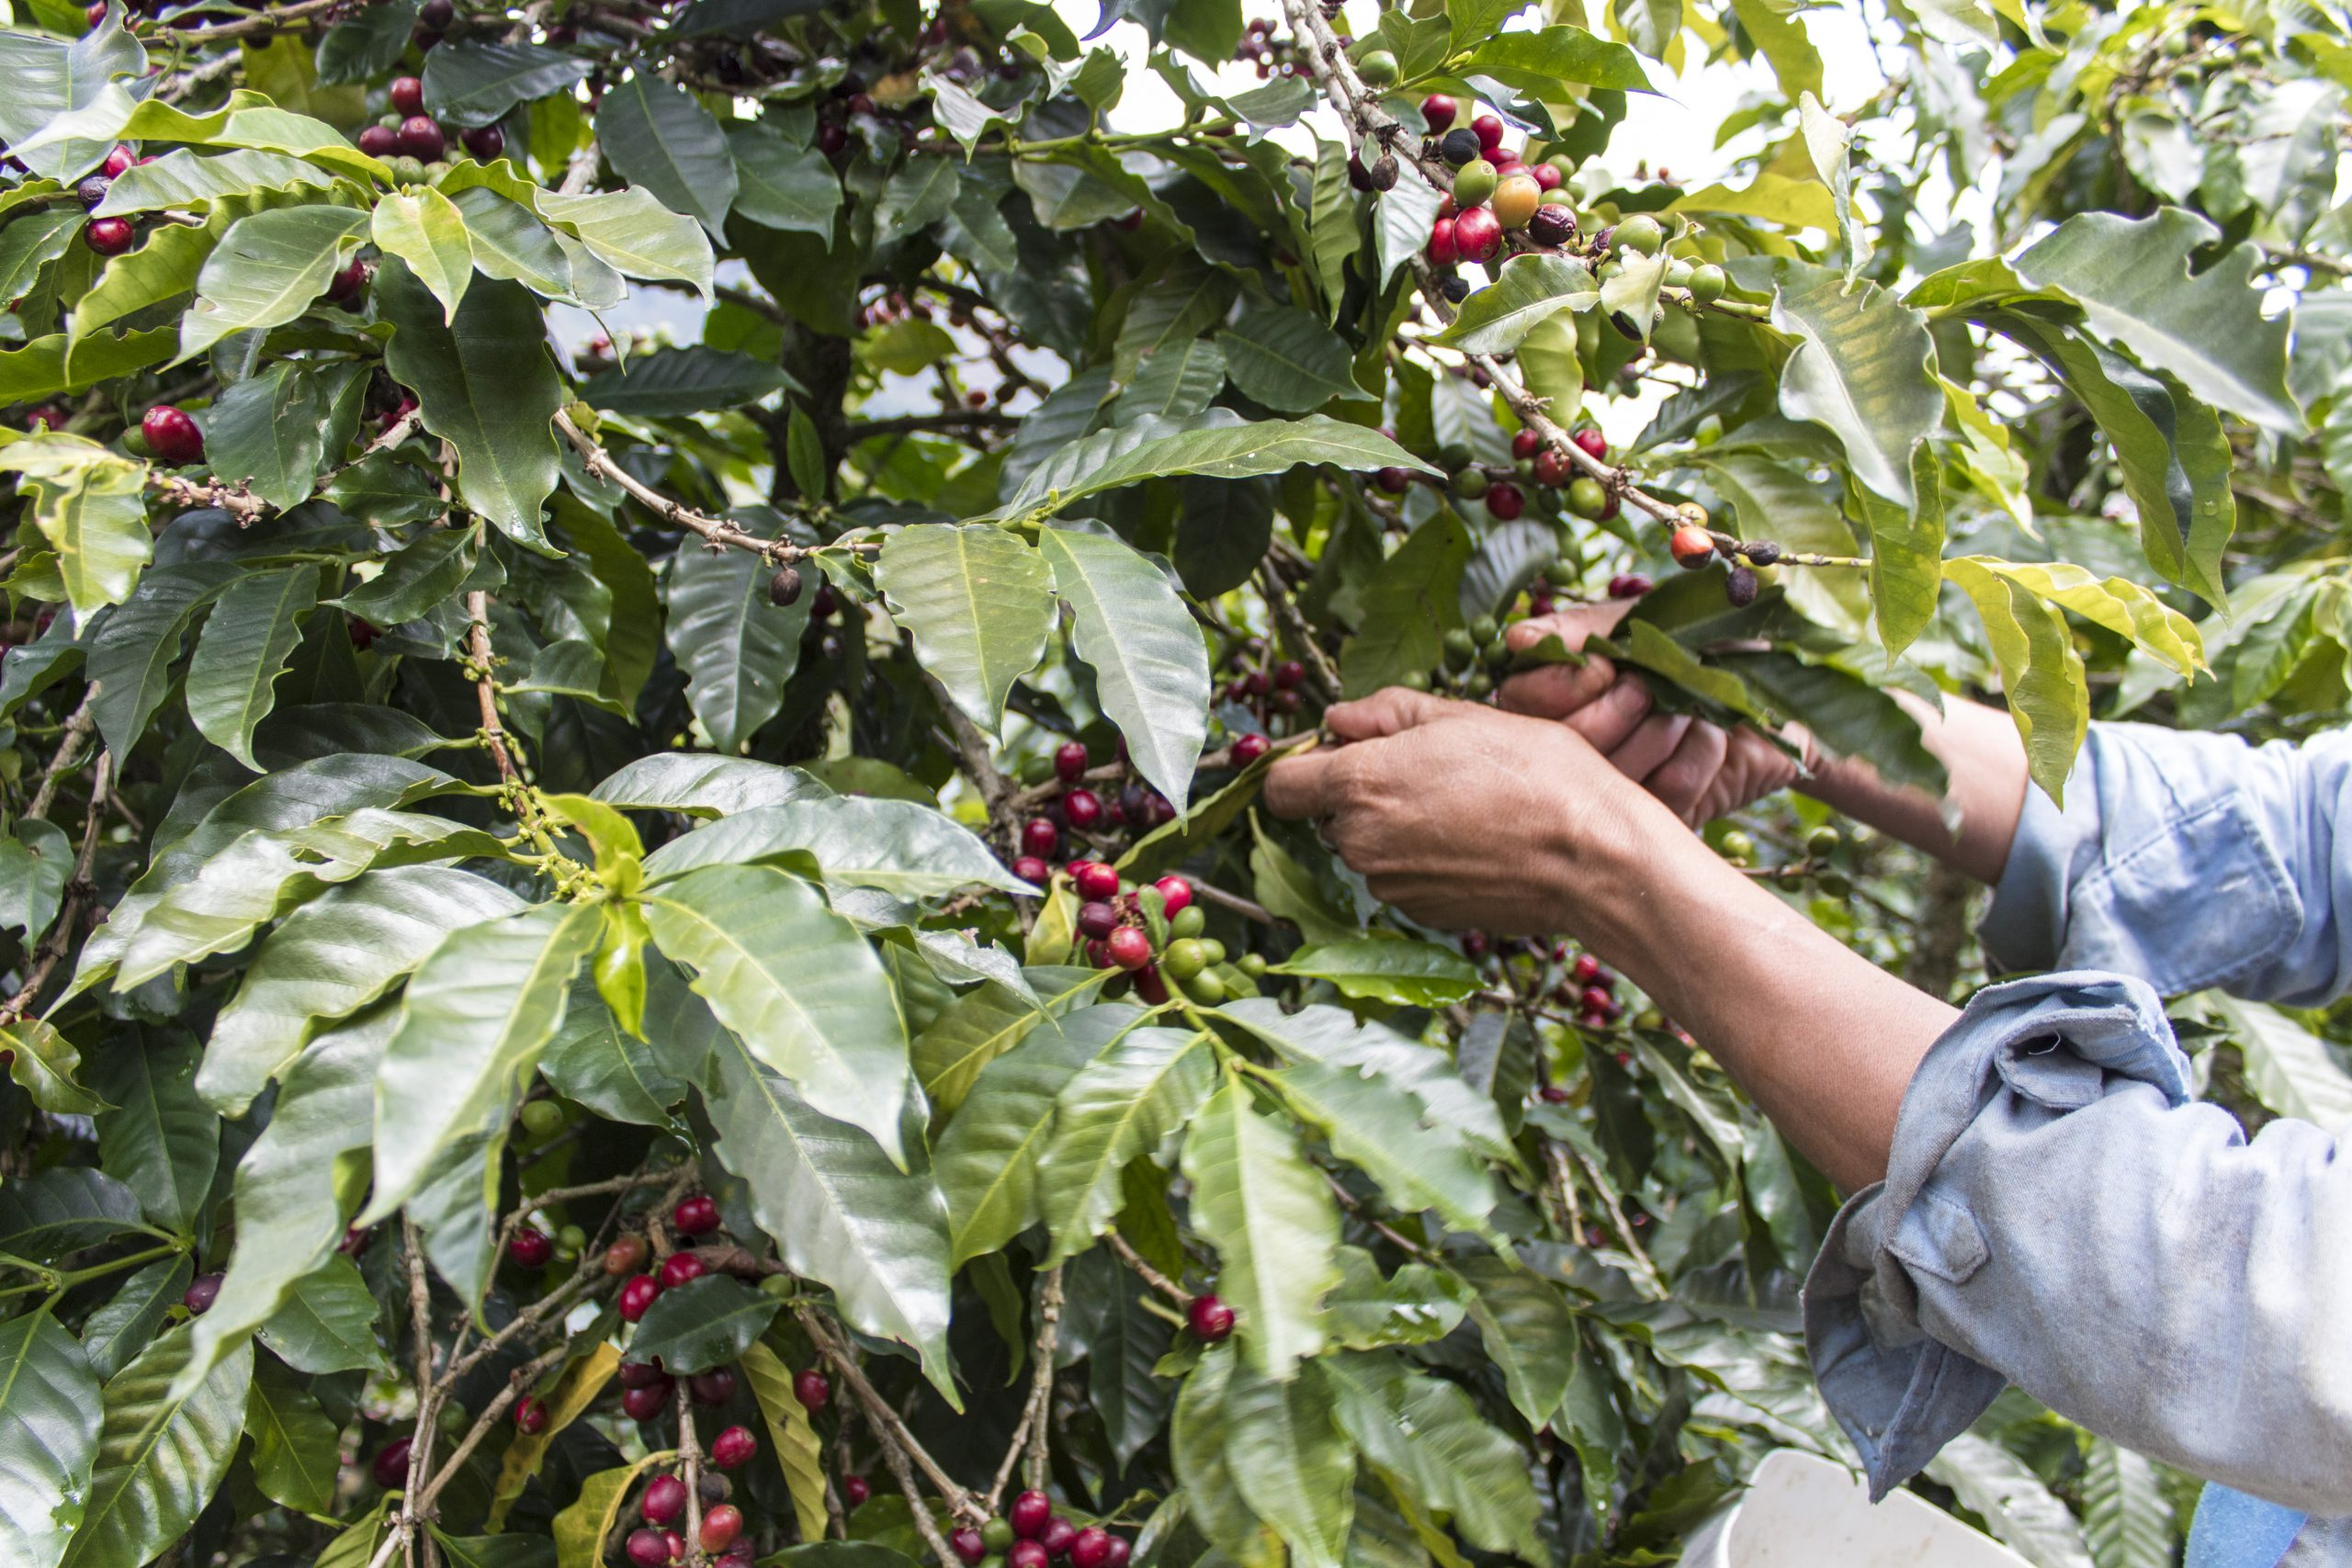 Man harvesting a coffee tree